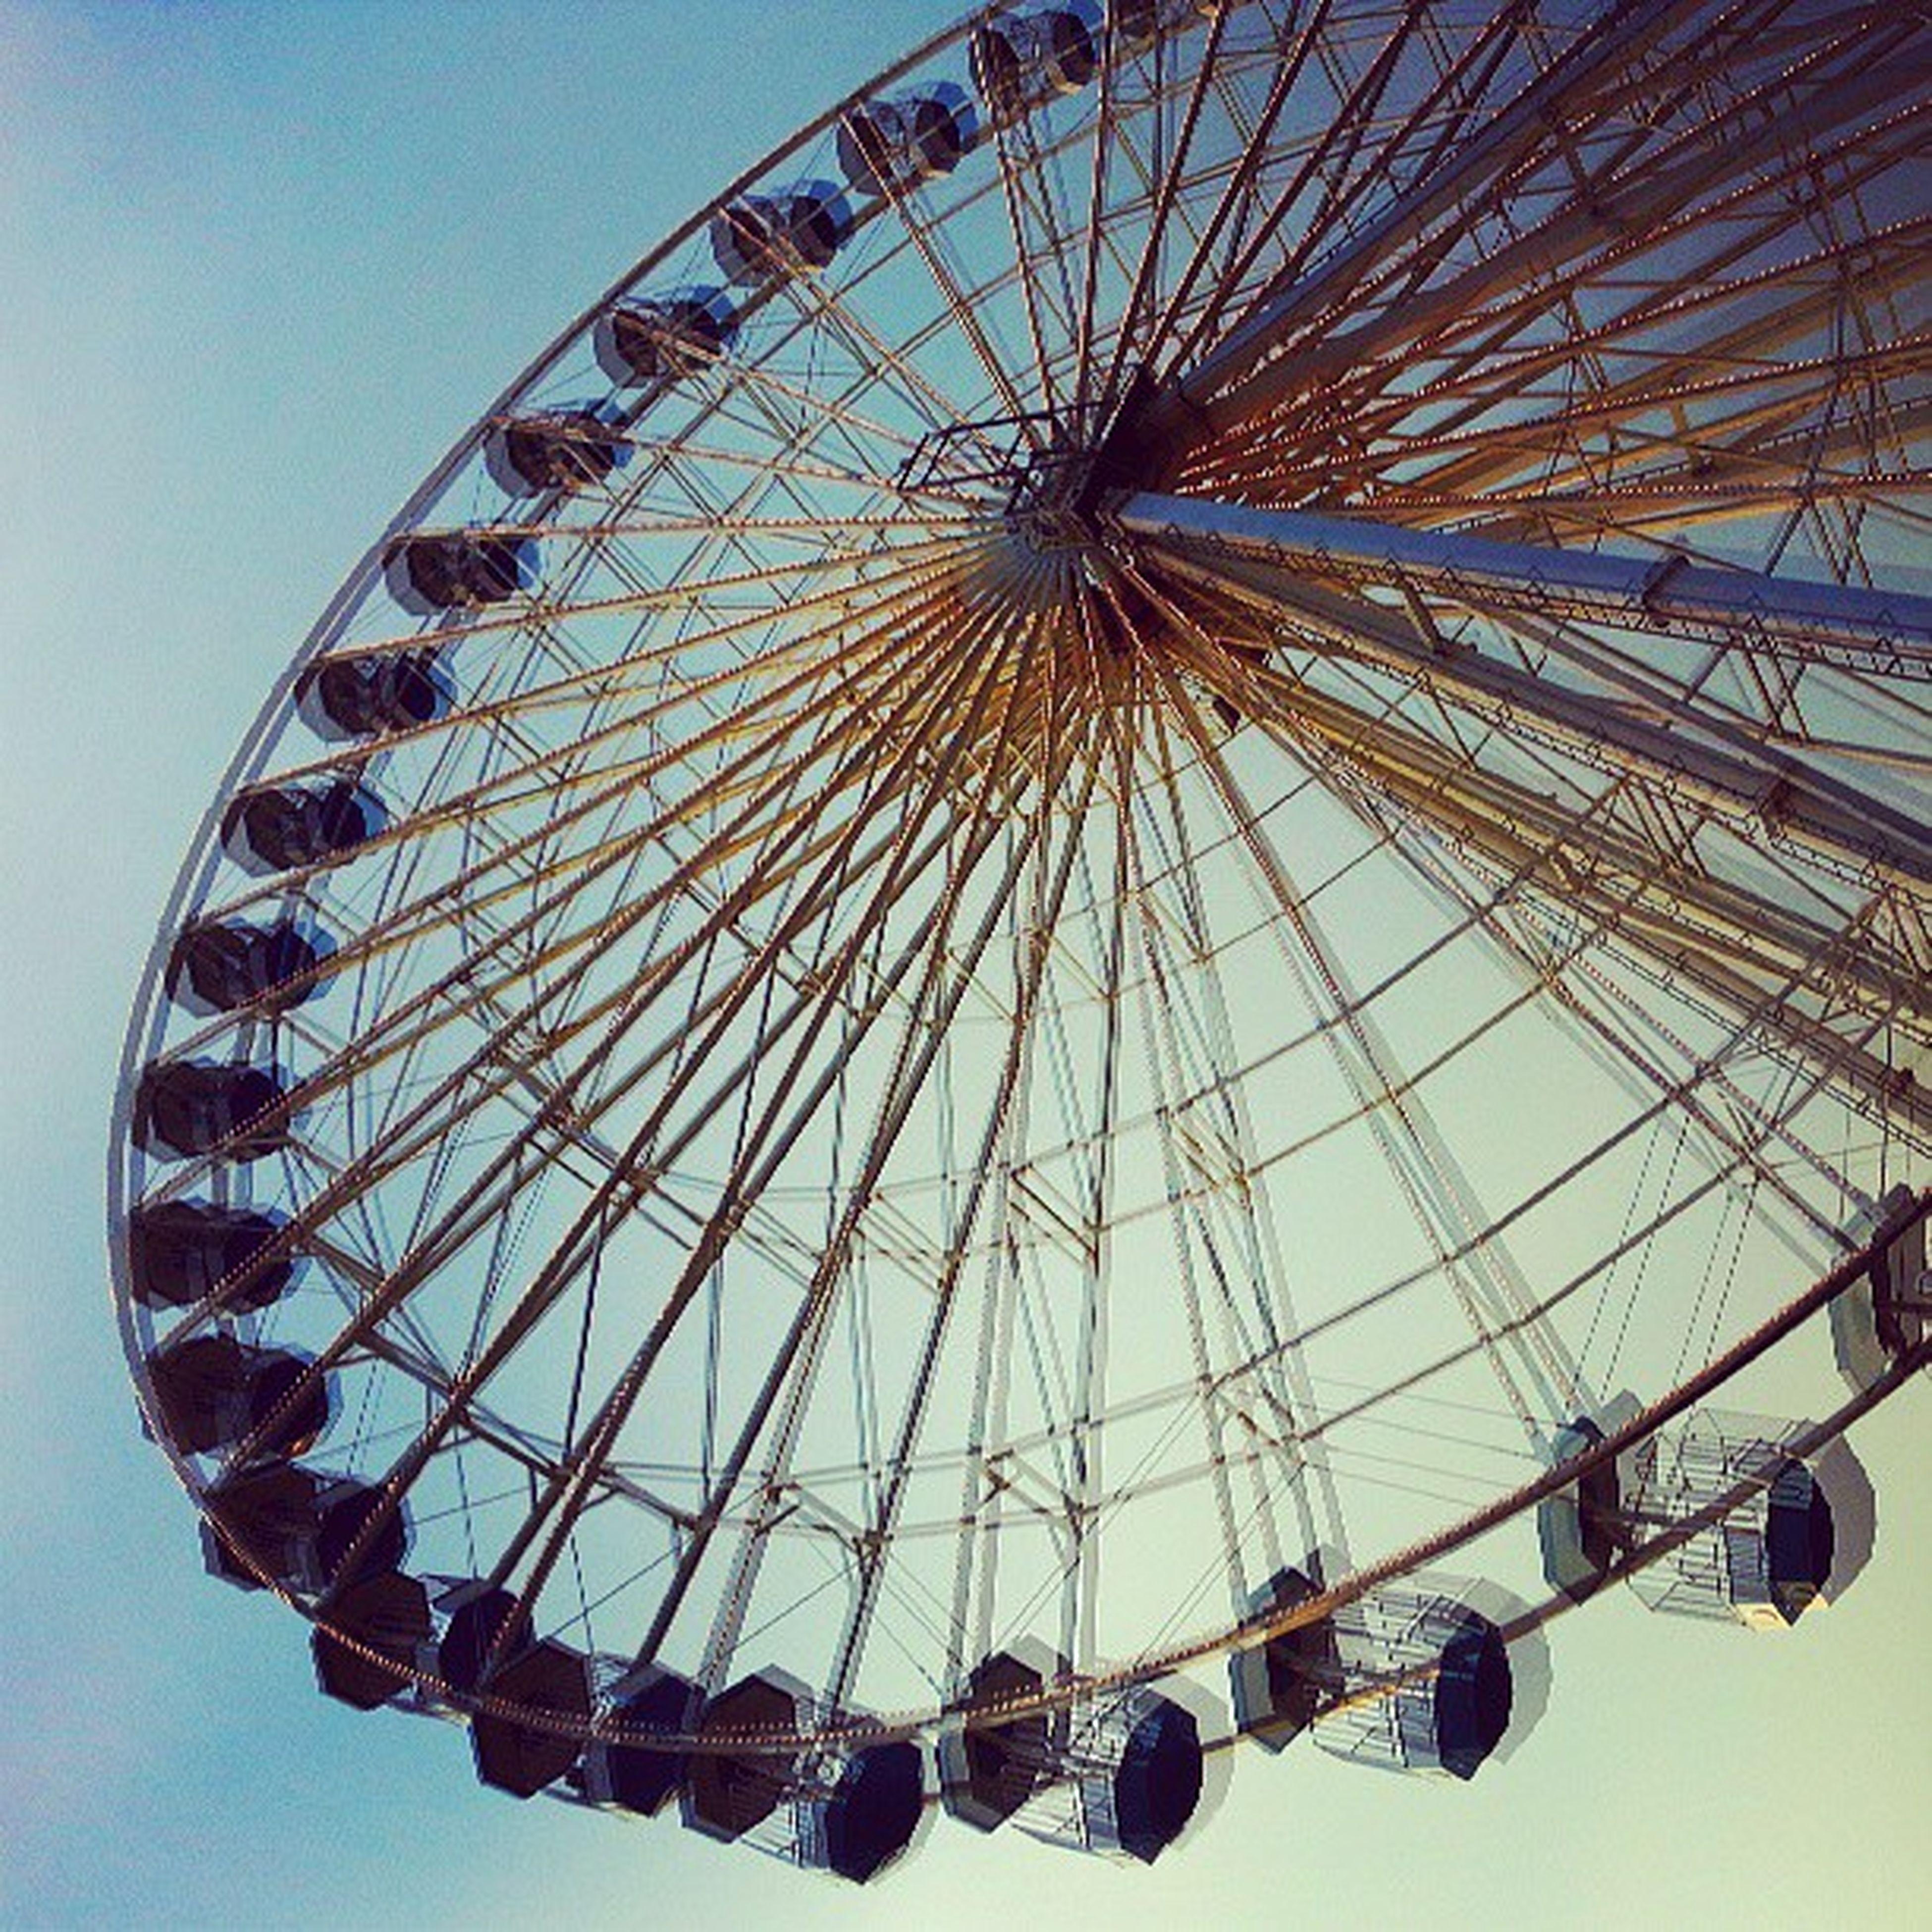 low angle view, amusement park ride, amusement park, ferris wheel, arts culture and entertainment, clear sky, built structure, sky, architecture, circle, pattern, fun, metal, day, blue, geometric shape, fairground ride, outdoors, design, no people